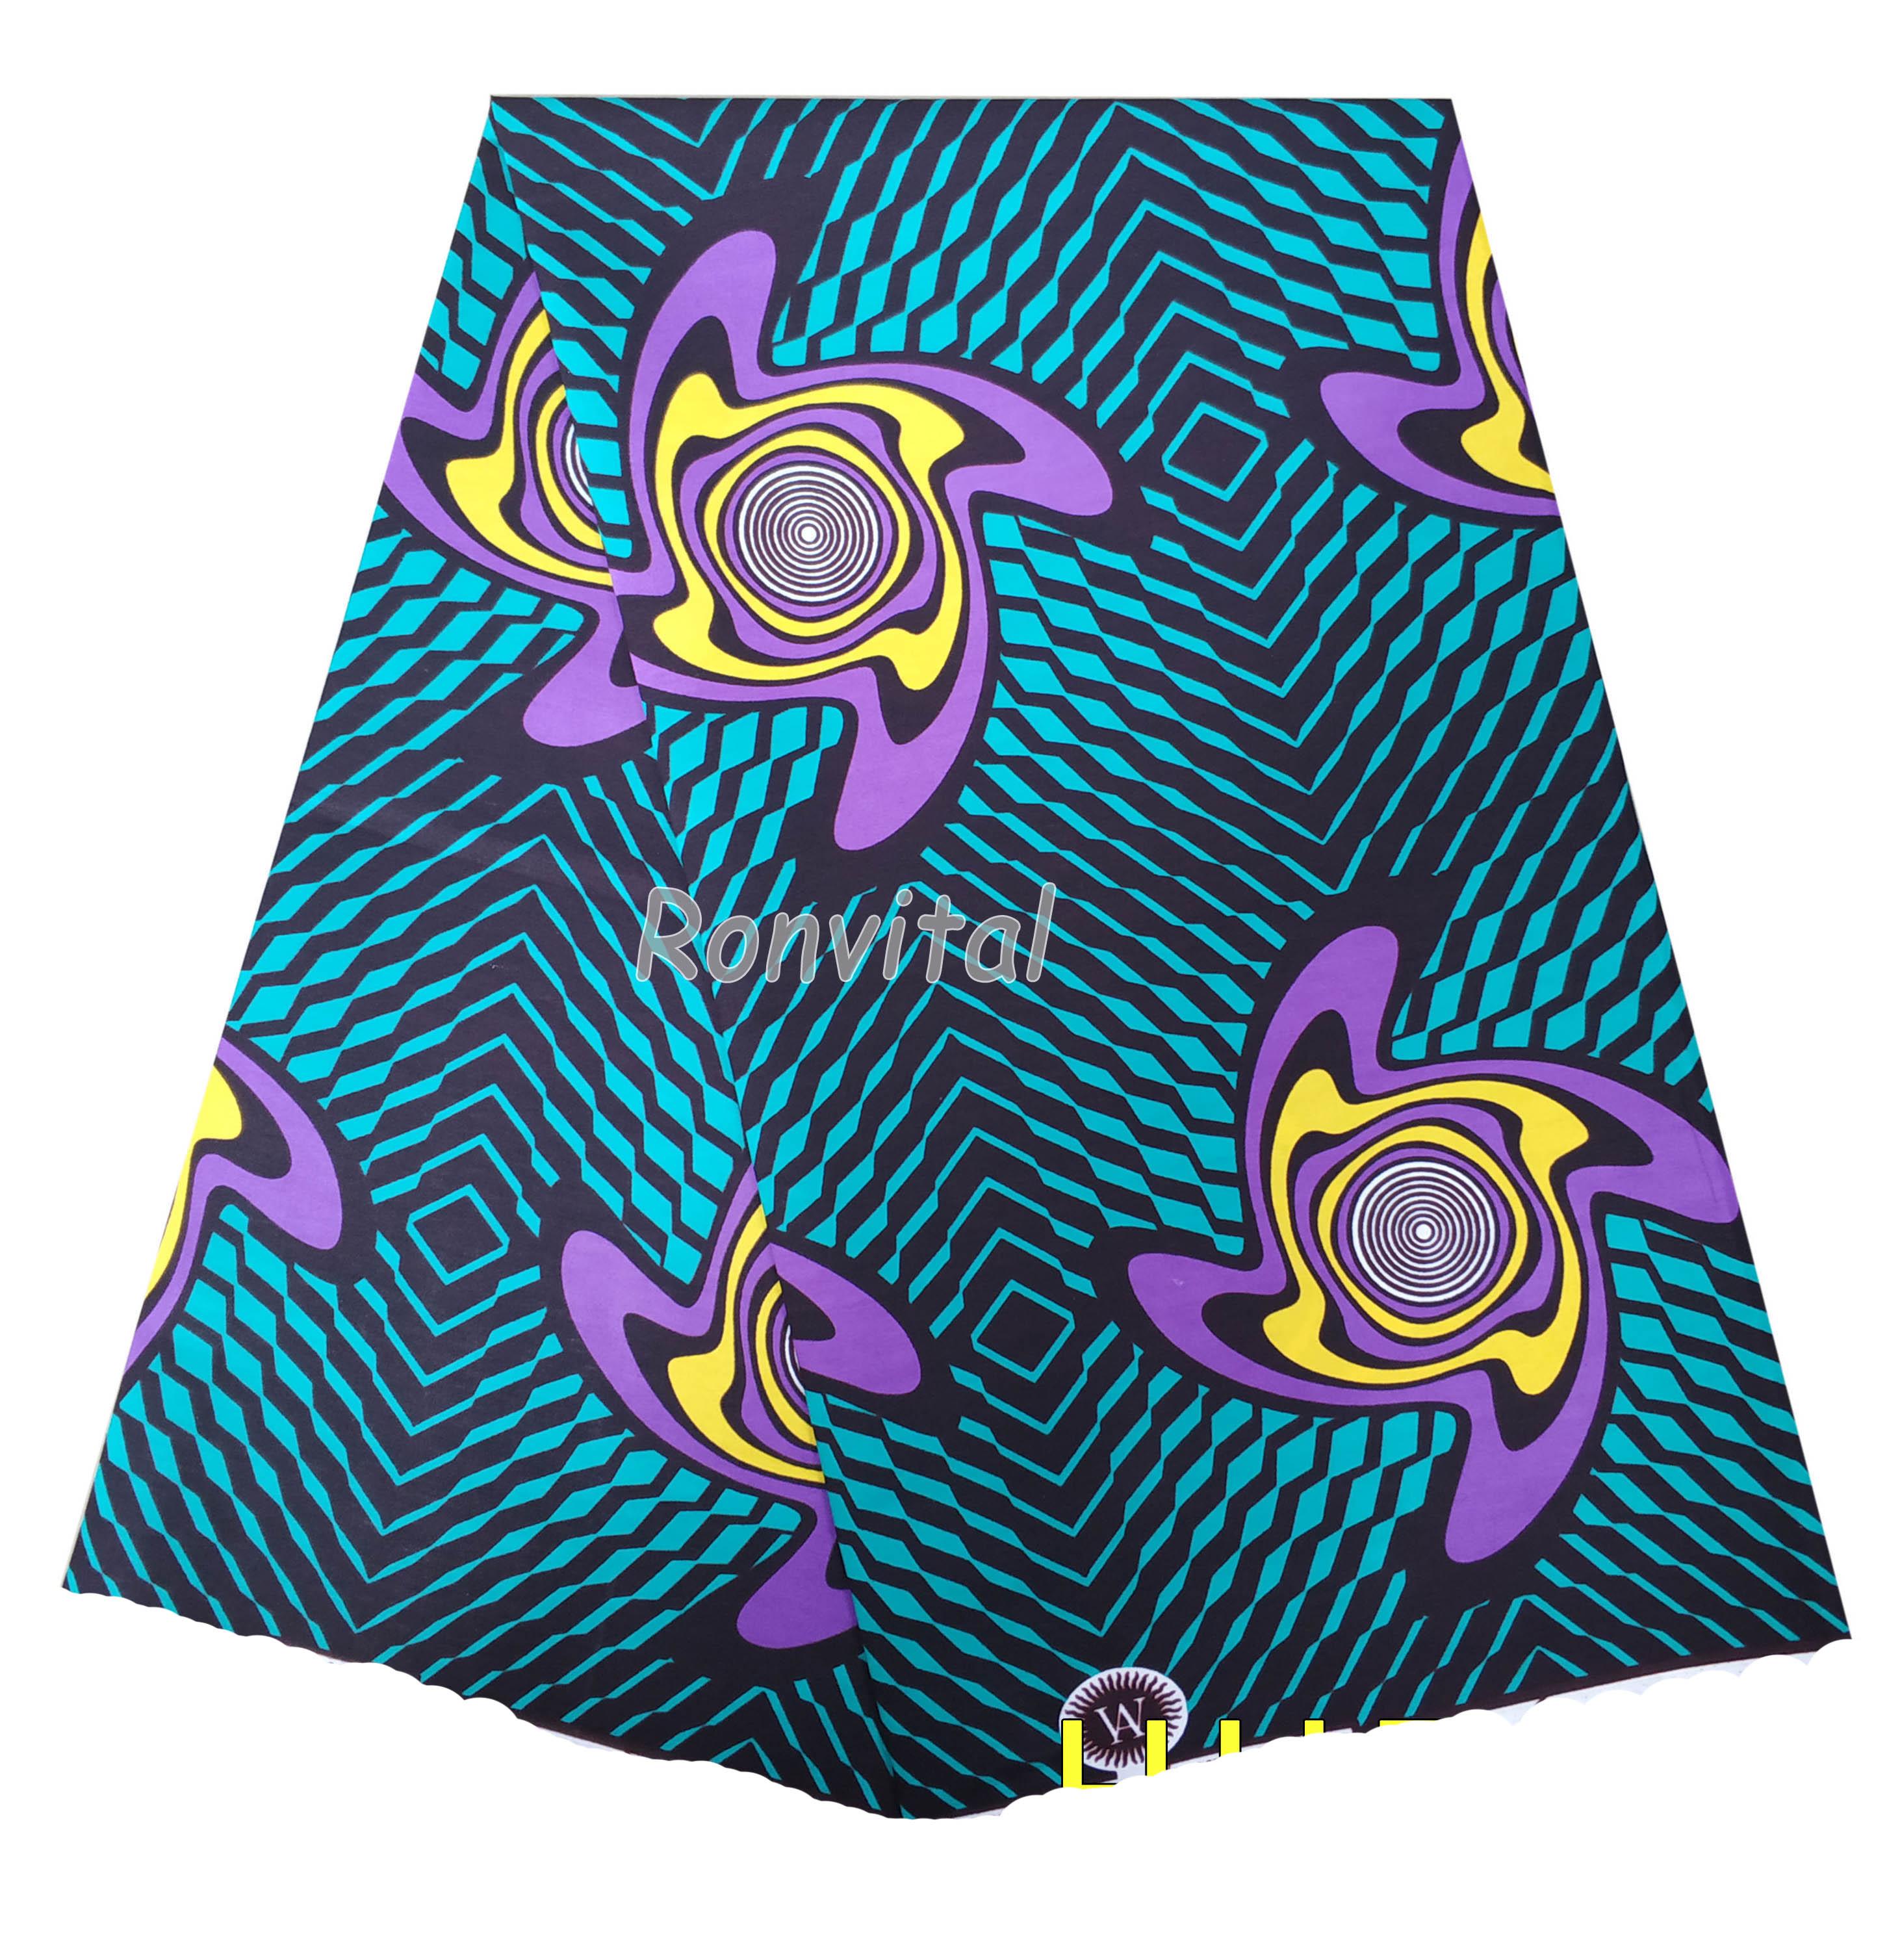 African Wax Print Fabric 100% Cotton Material Ankara Fabric 6yards/pcs For African Women Dresses